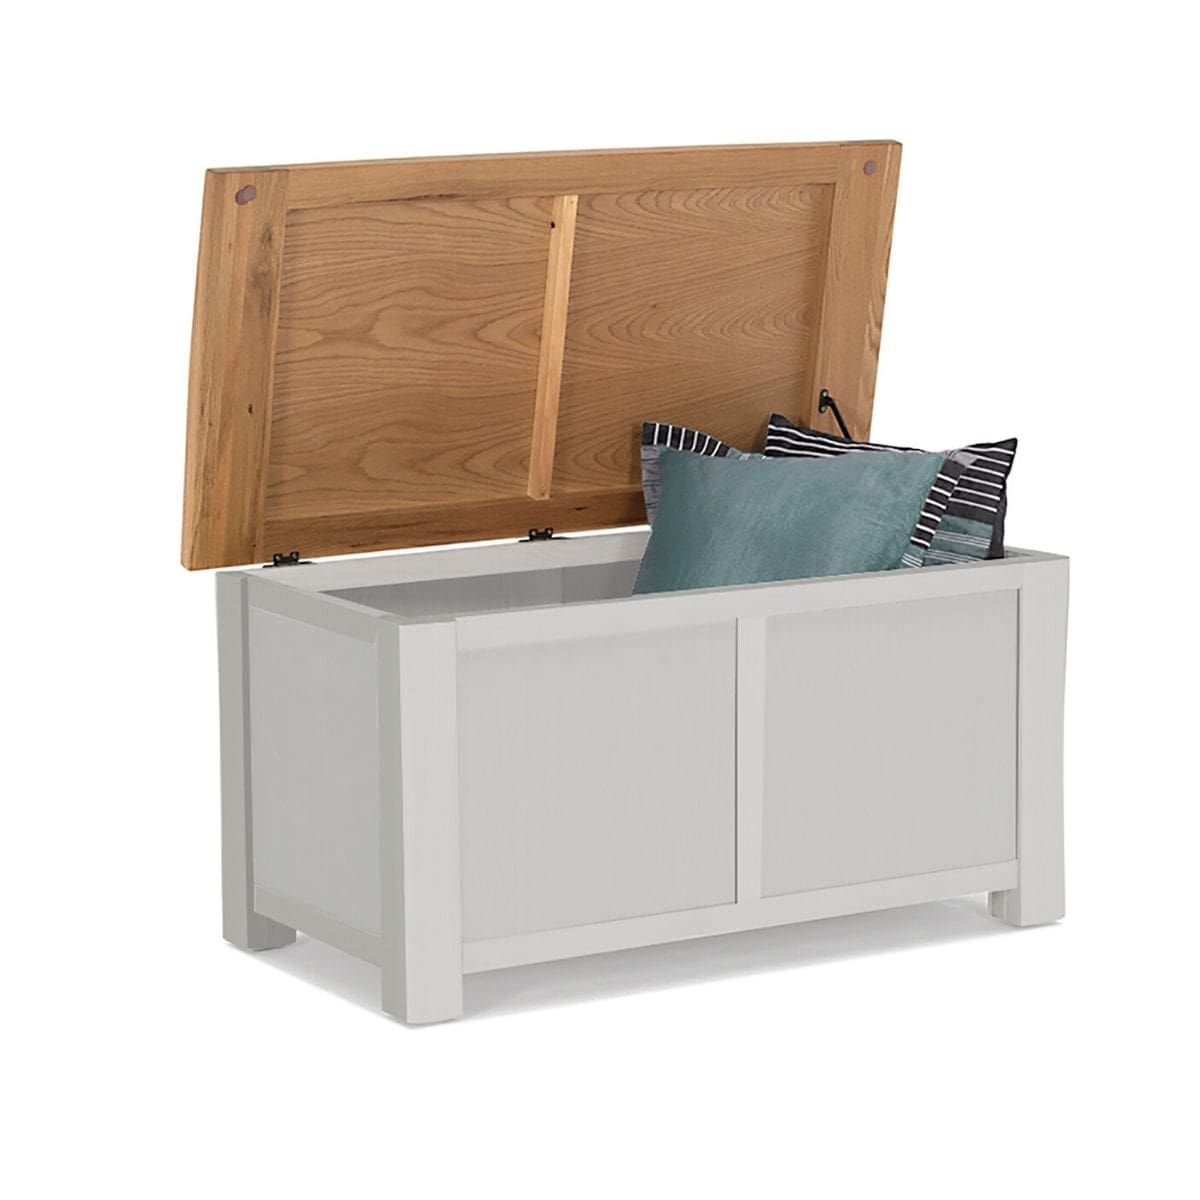 Grey Wooden Blanket Box